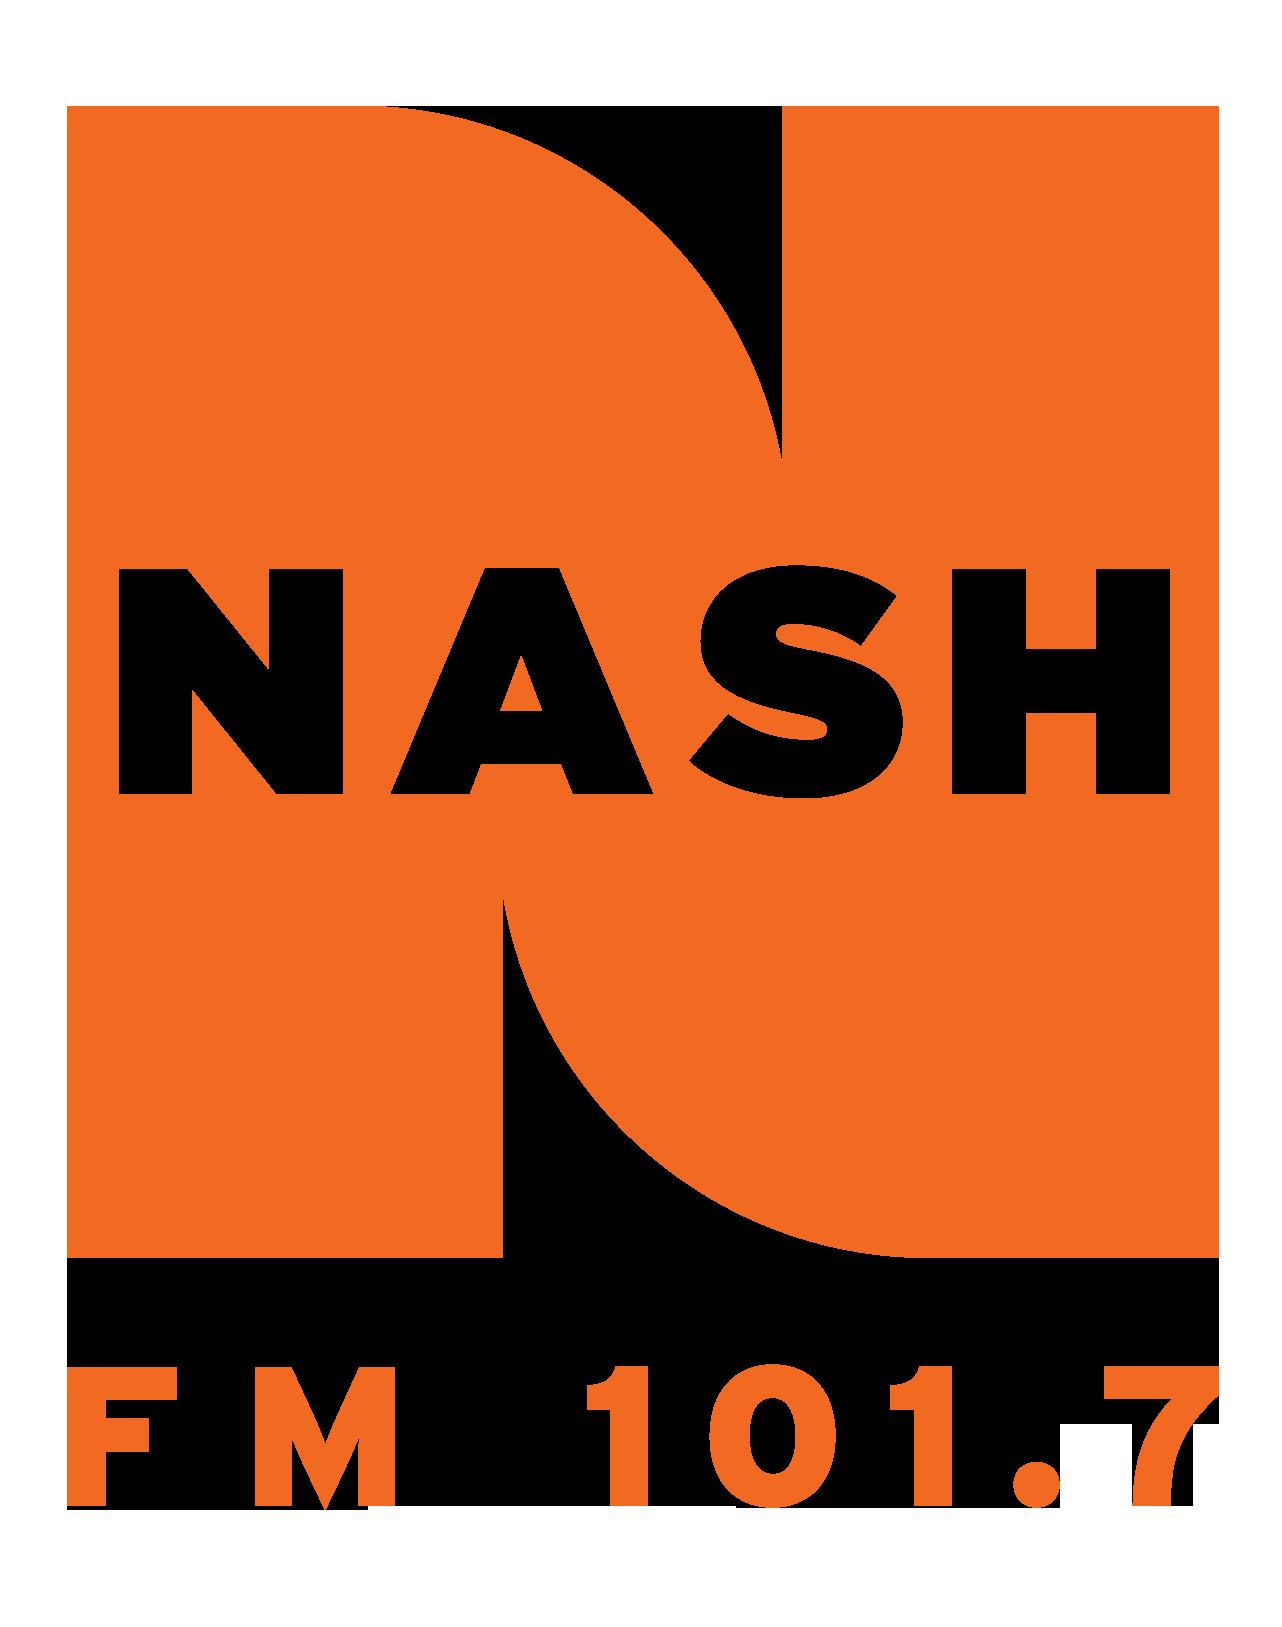 NASH FM Music